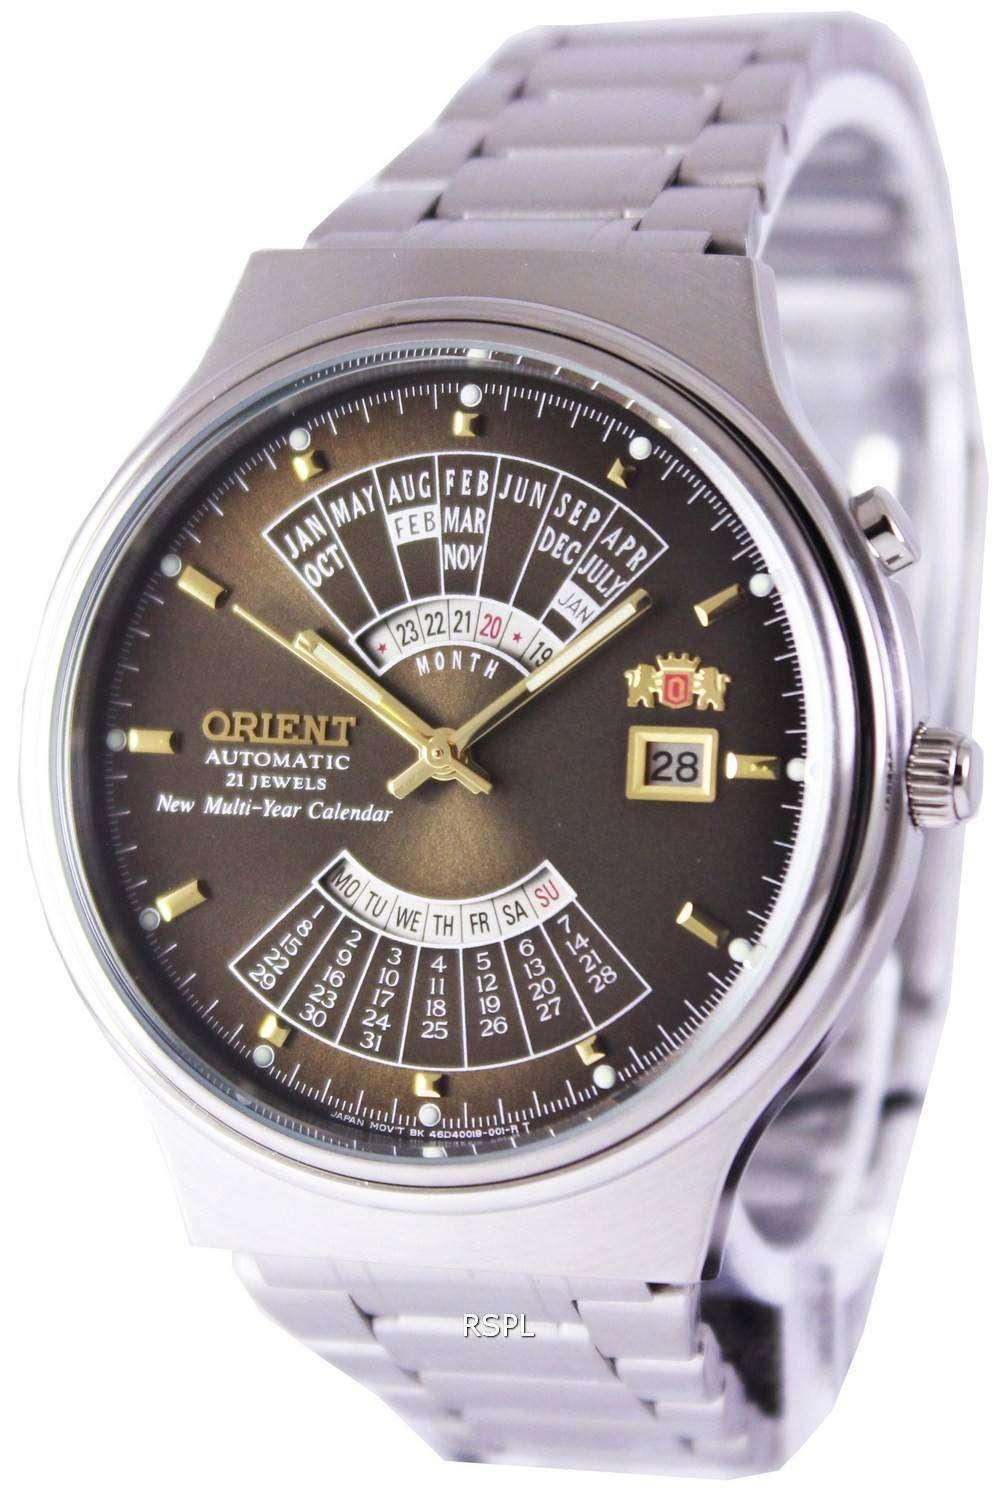 Orient Automatic 21 Jewels Multi Year Calendar Feu00002tw